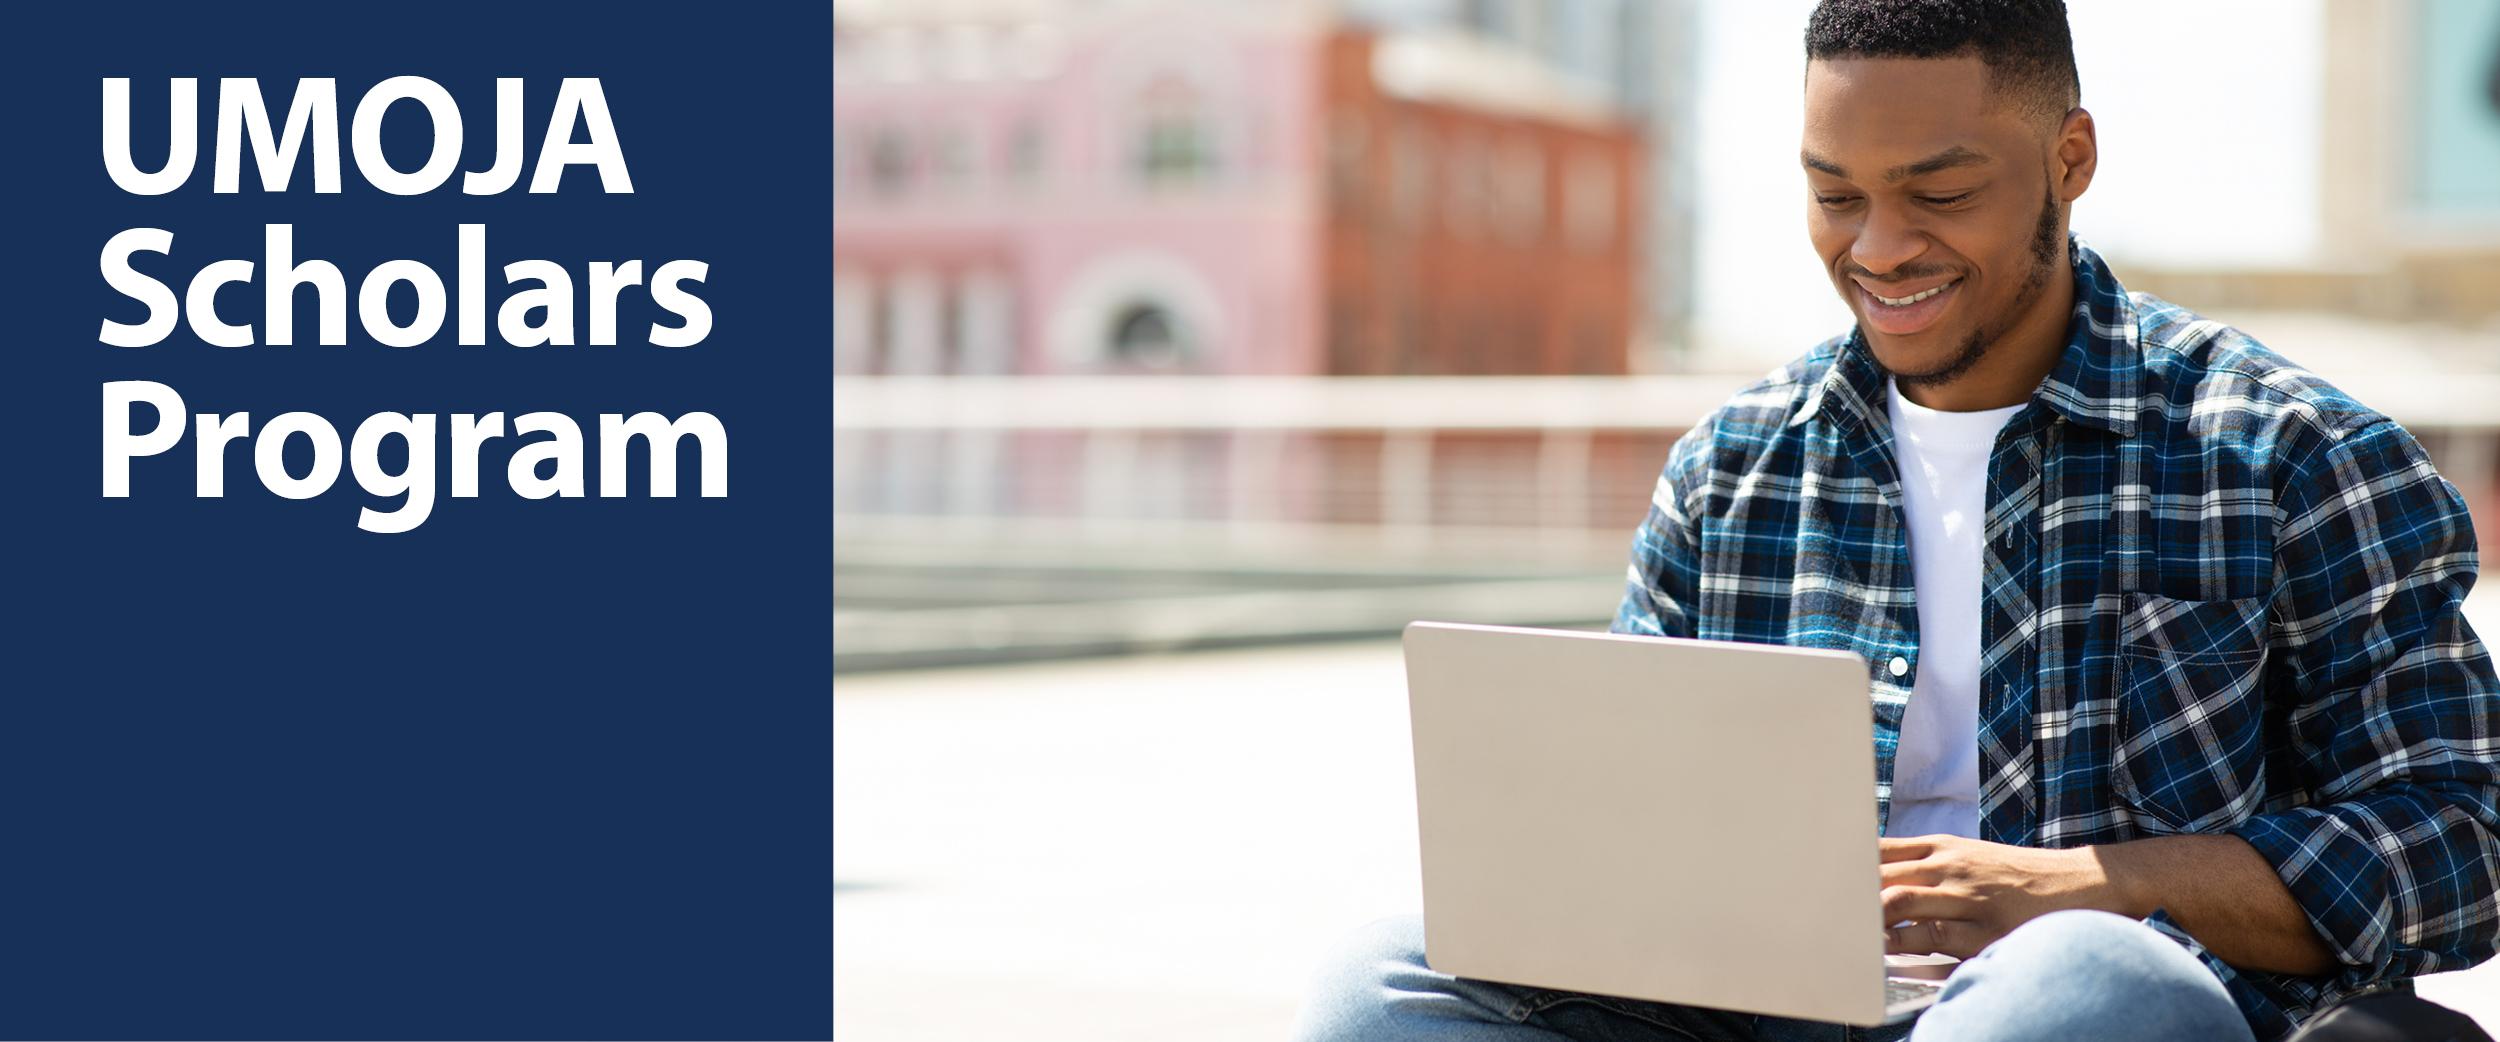 UMOJA Scholars Program. A Black/African American student on a laptop.